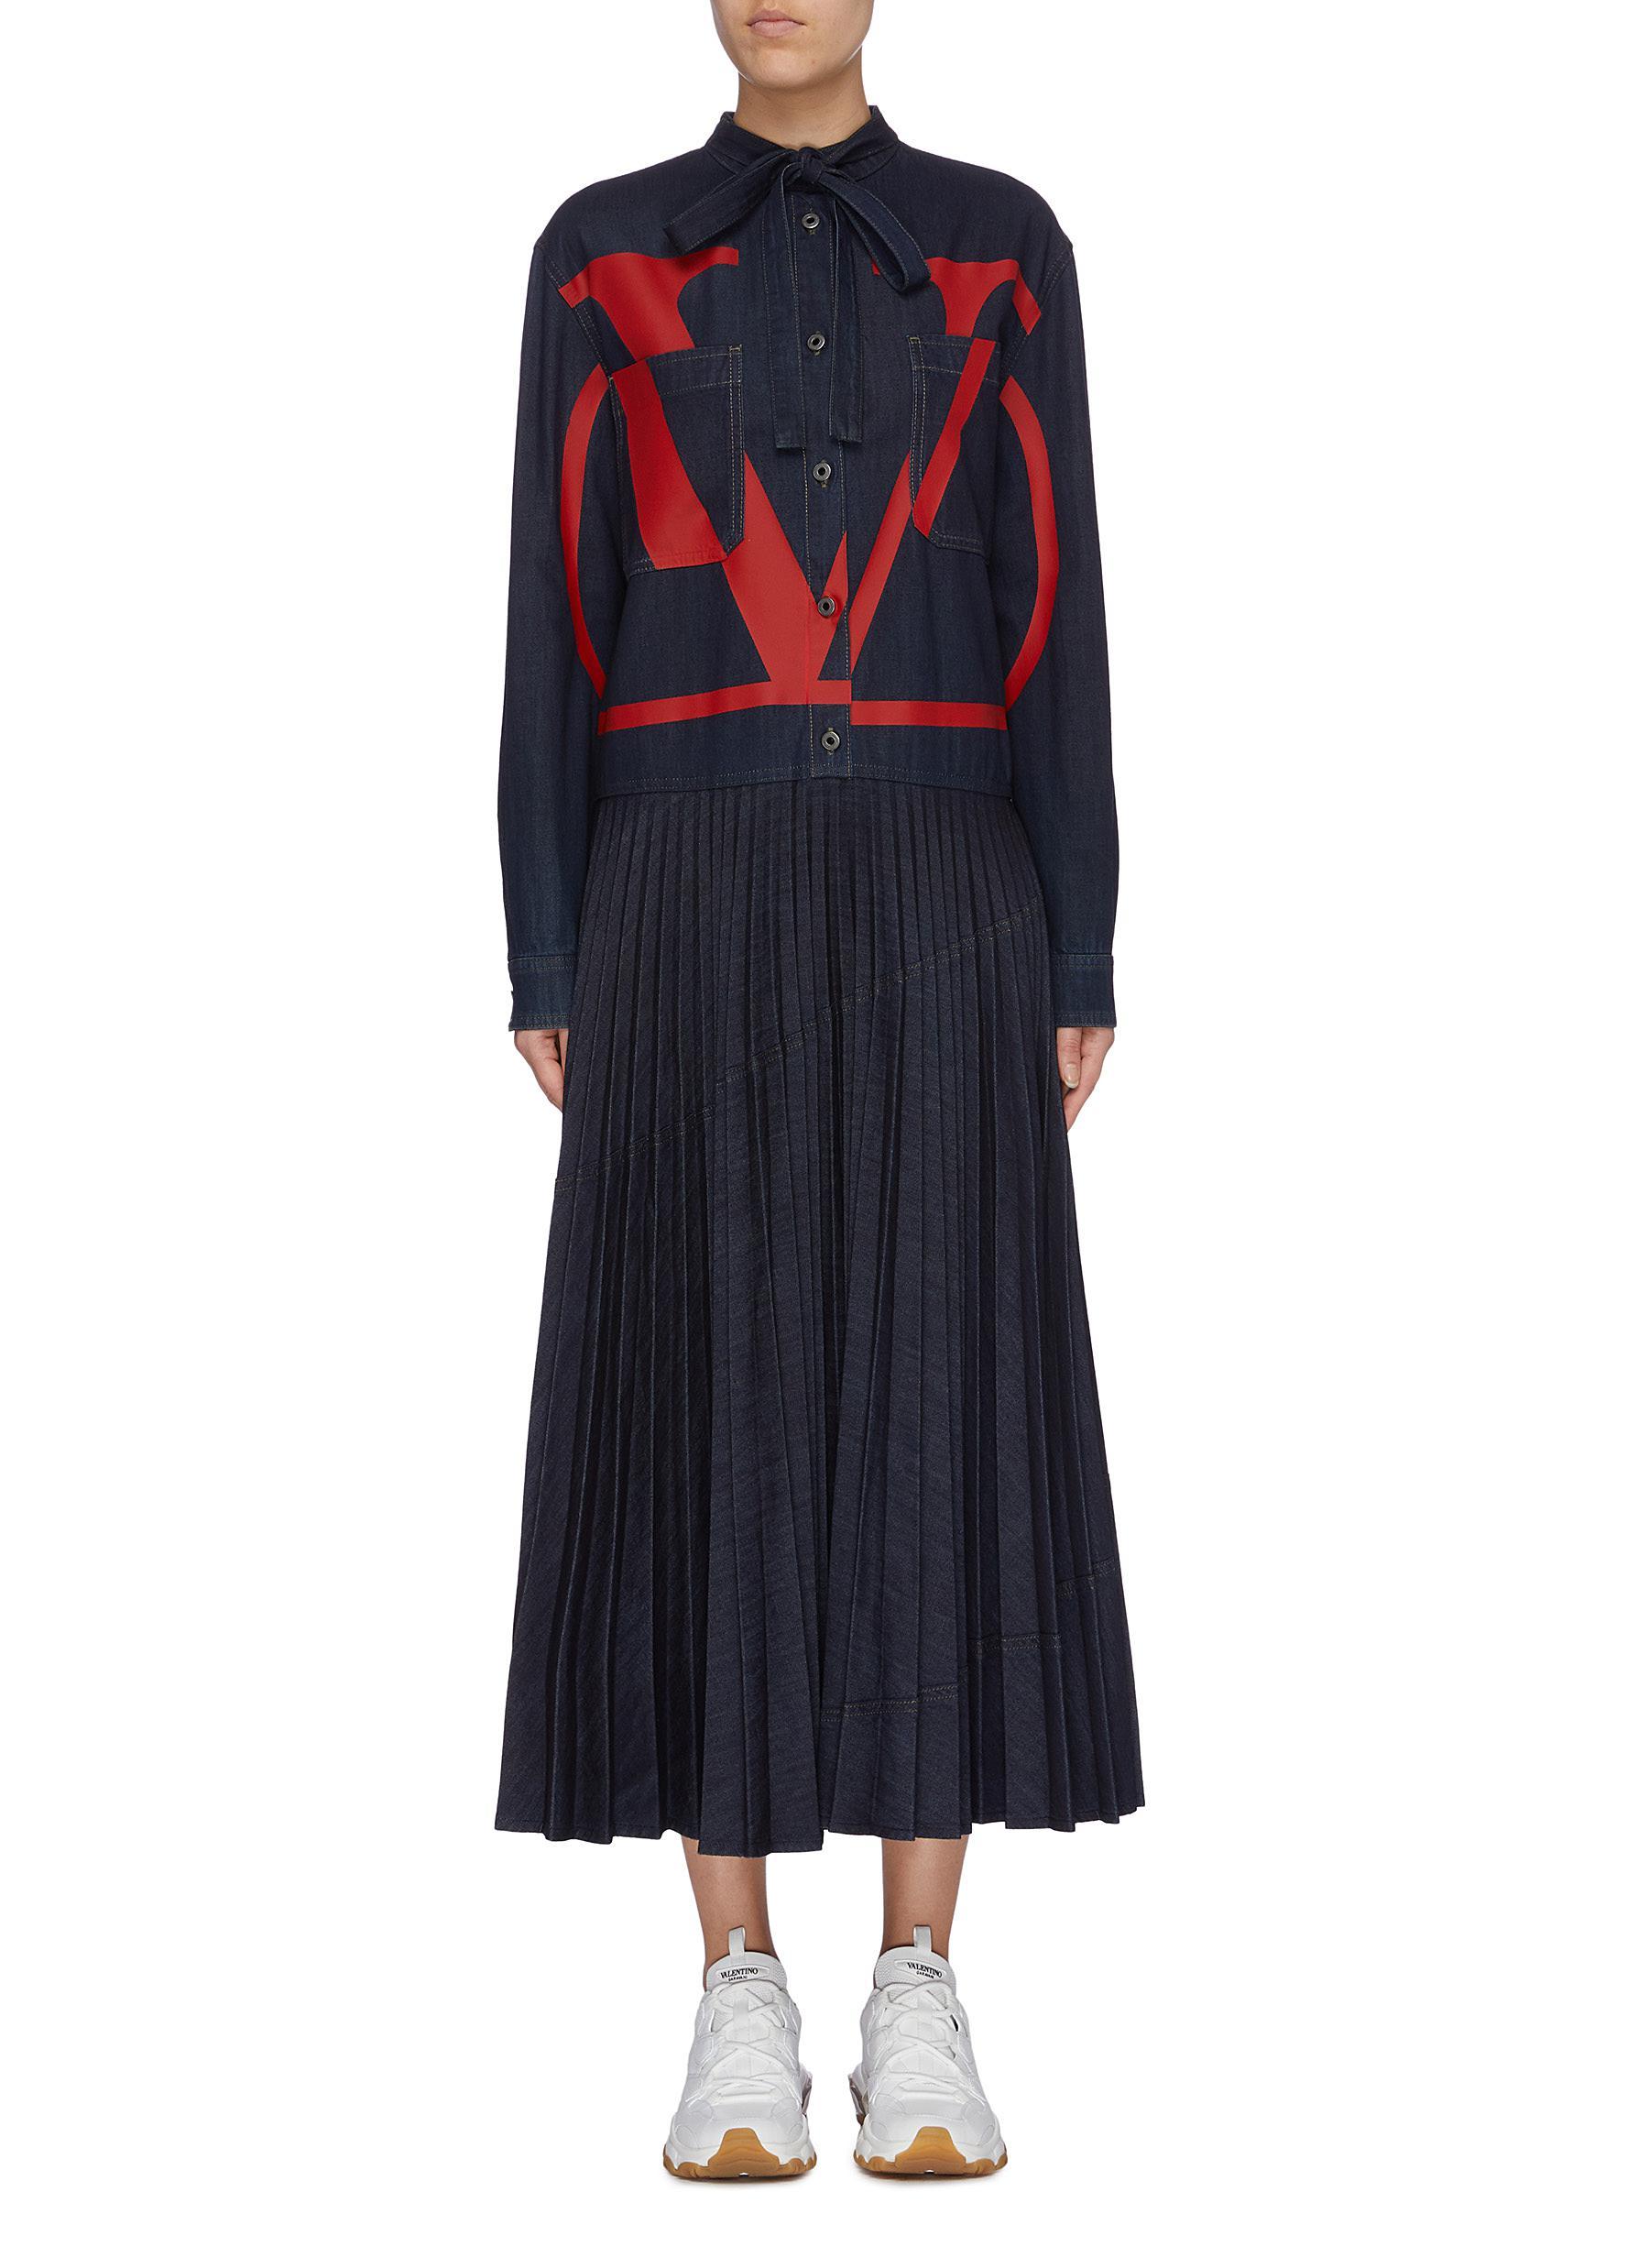 VLOGO print shirt panel pleated denim dress by Valentino